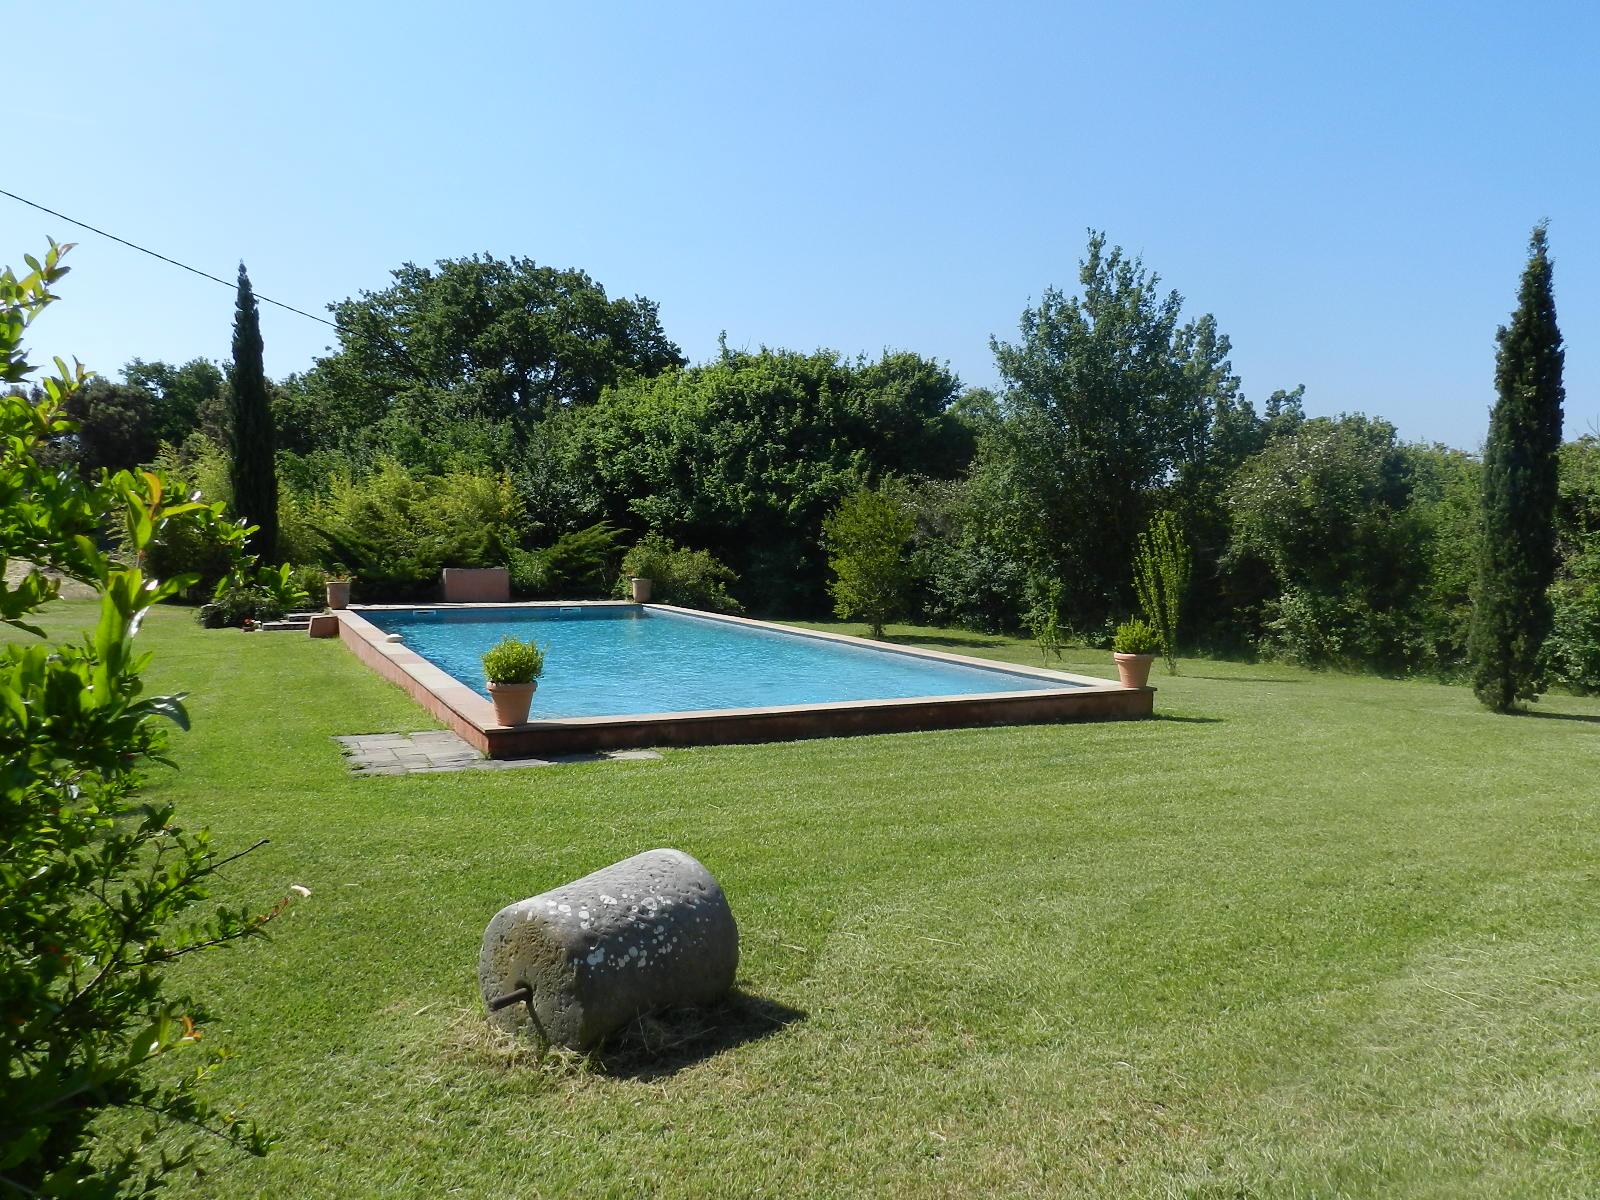 provence_sud_luberon_gîte_des_condamines_piscine_ensemble